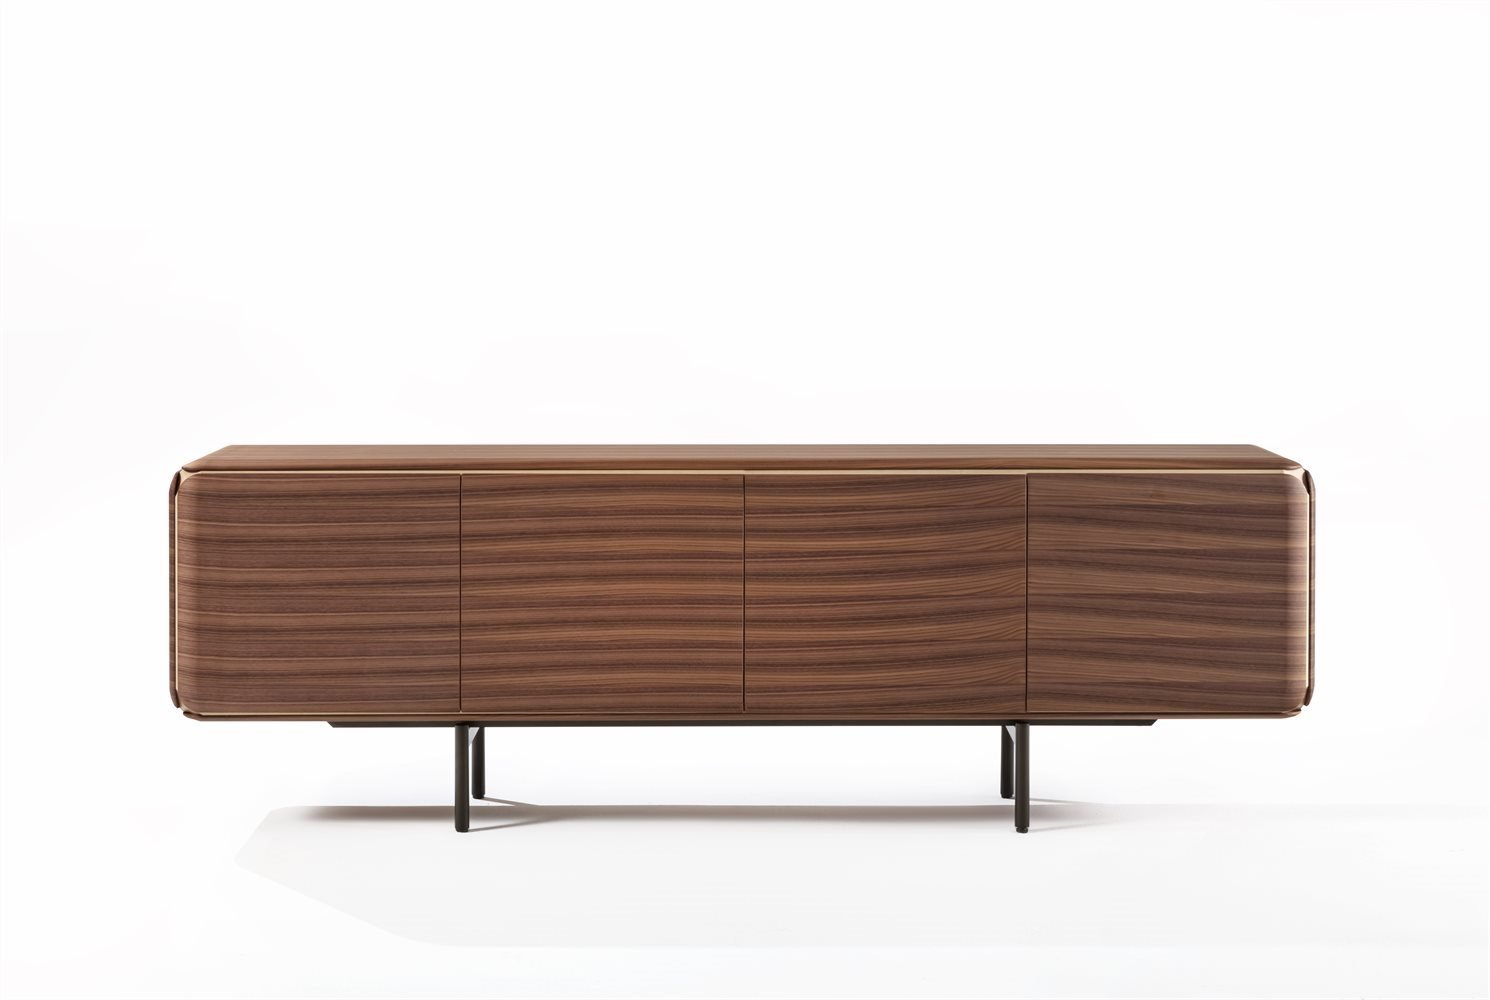 Pebble Sideboard from Porada, designed by N. Devetag